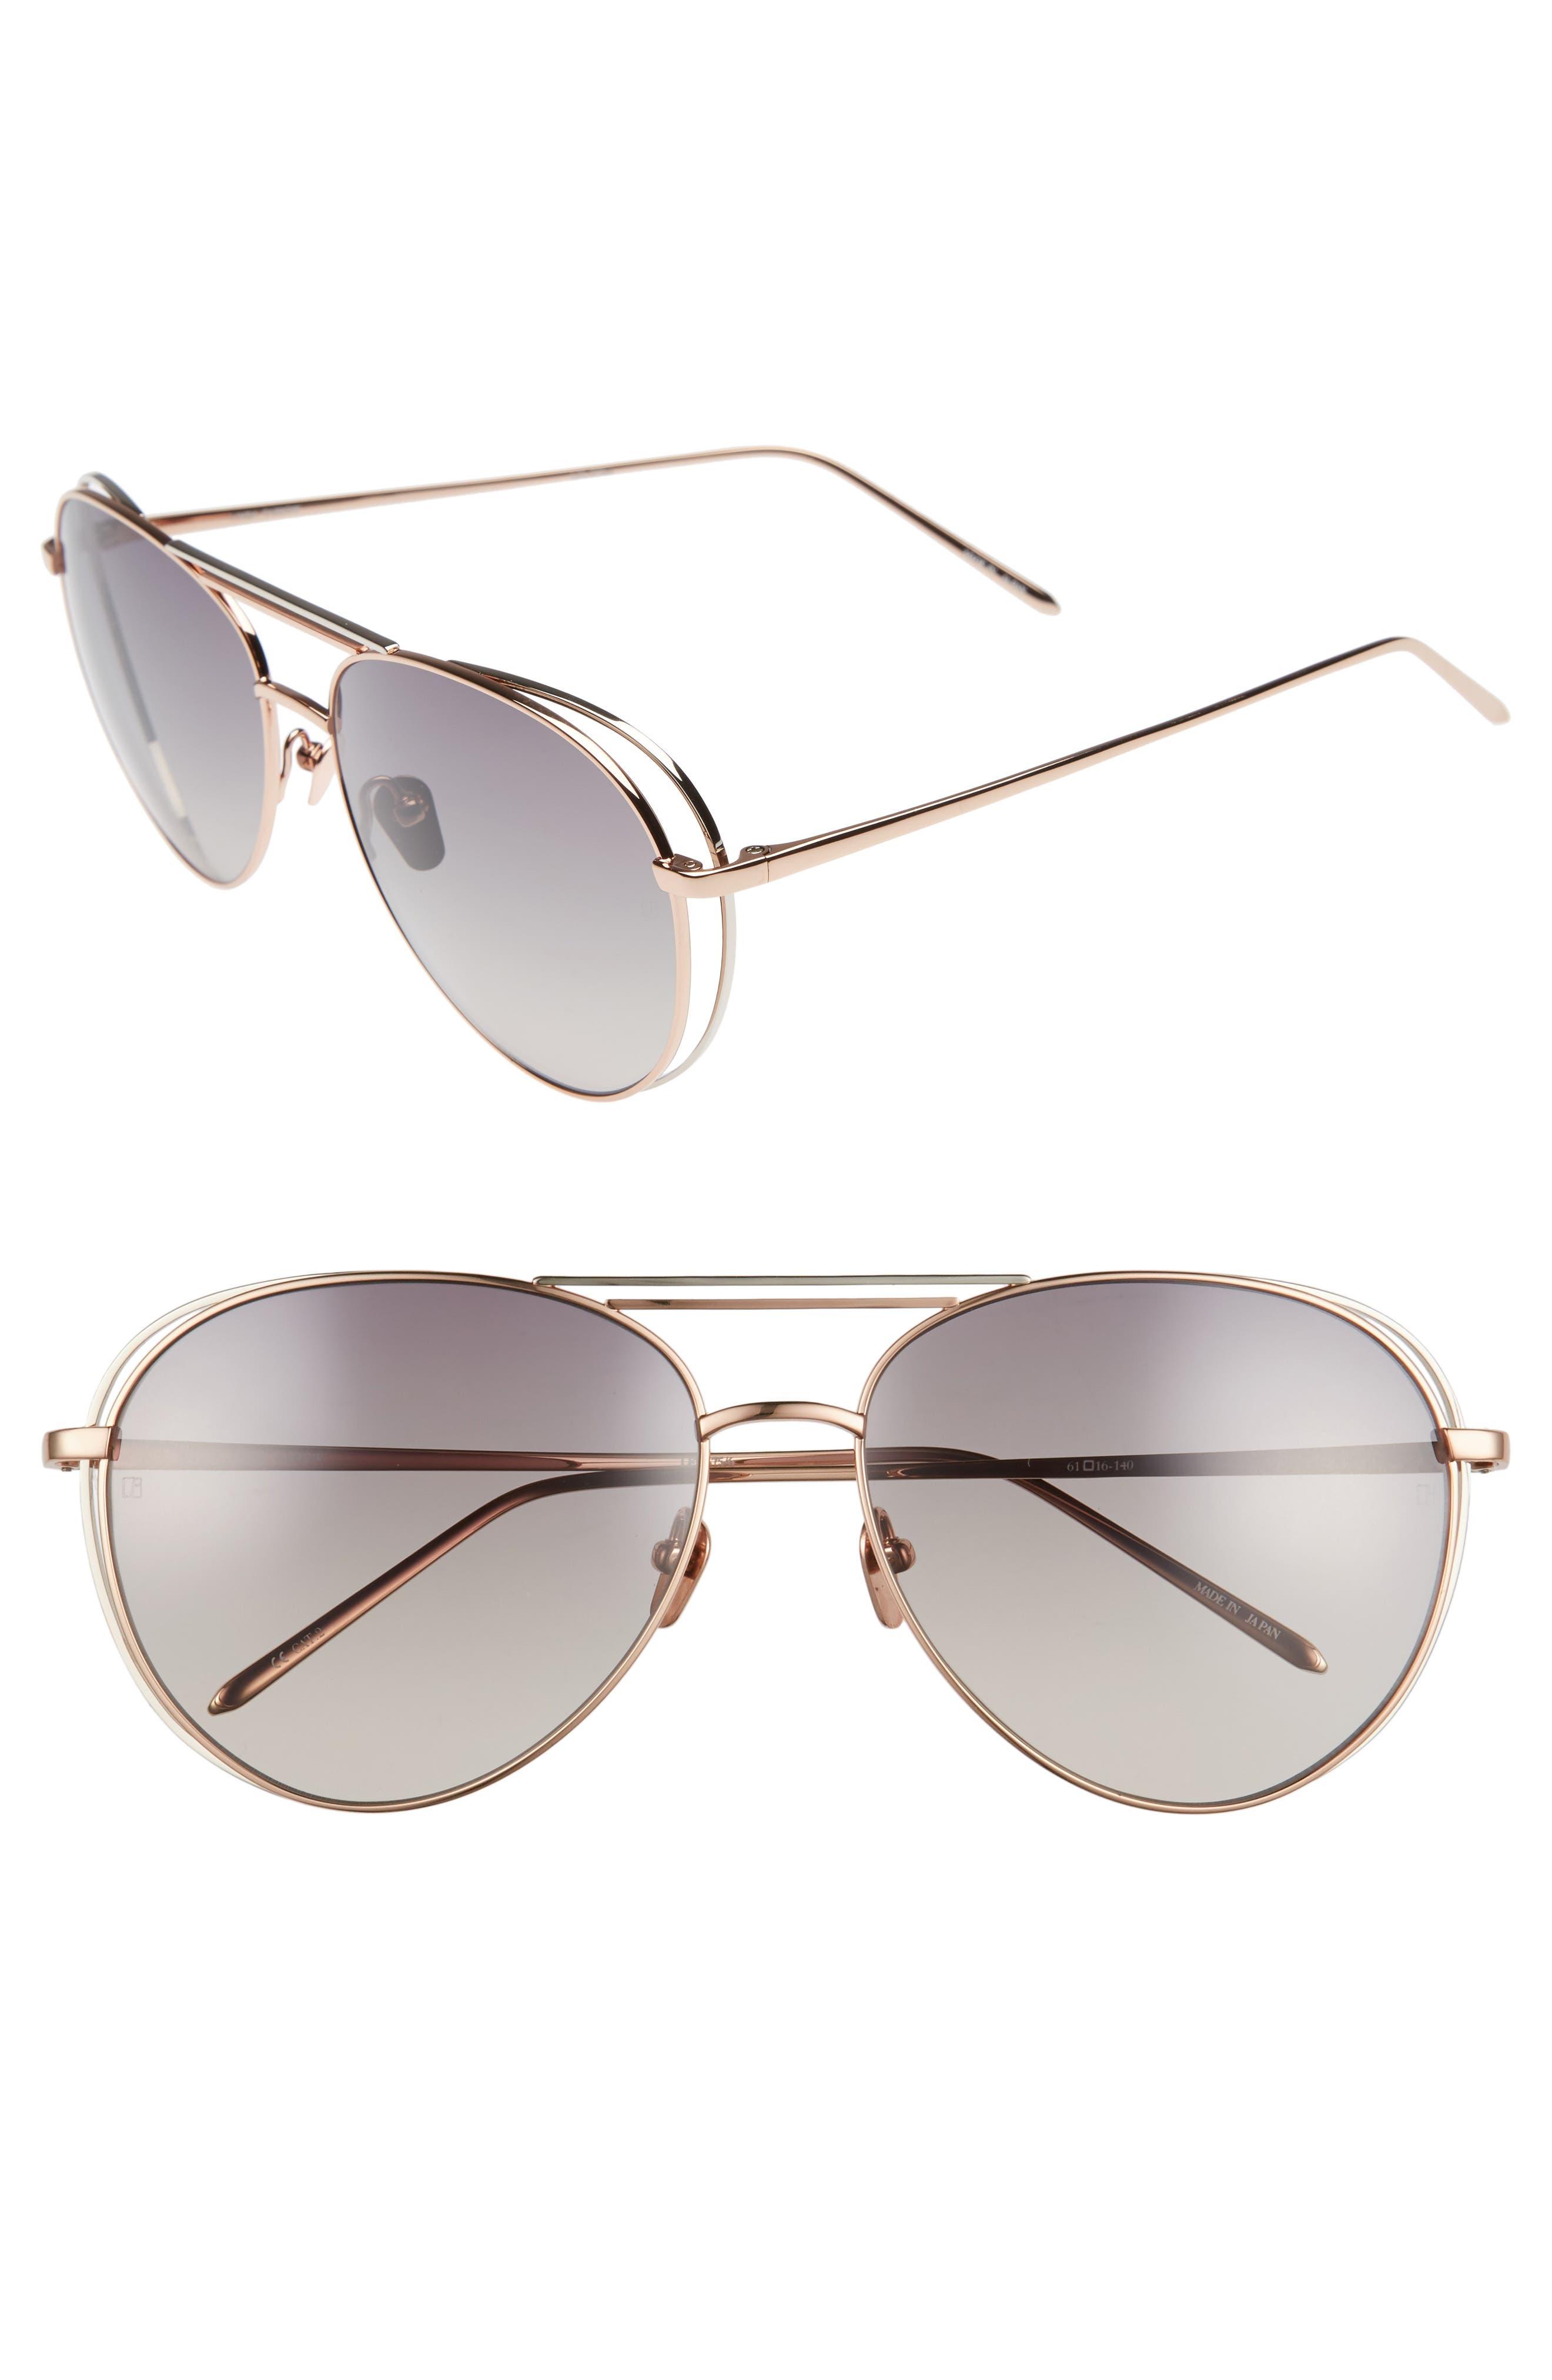 61mm 18 Karat Gold Aviator Sunglasses,                         Main,                         color, Rose Gold White Gold/ Grey